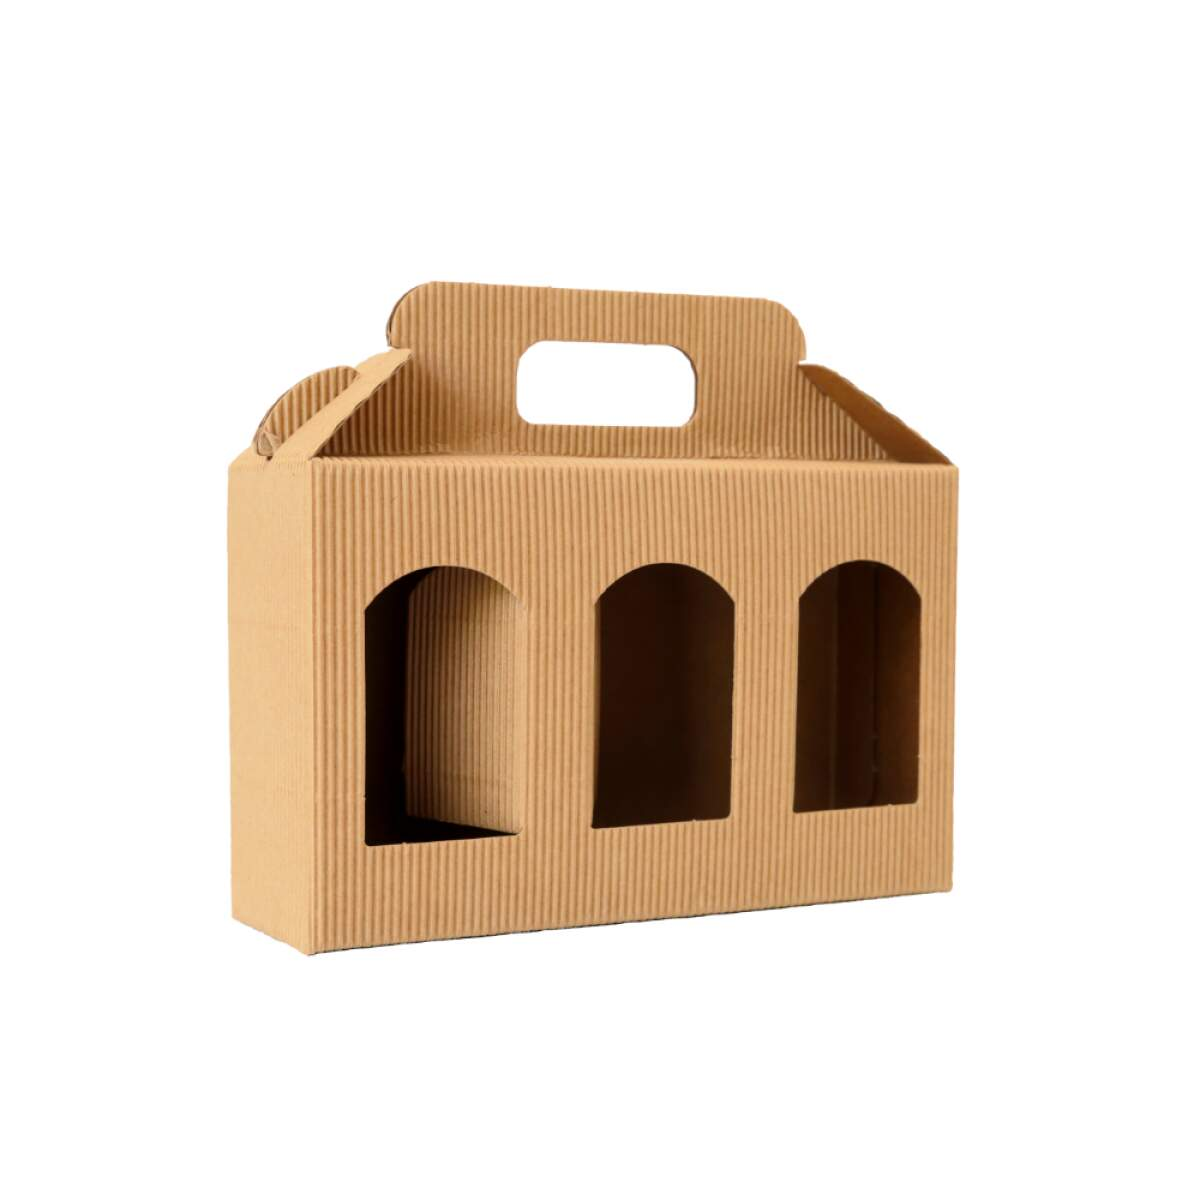 Box-Gr-L-Greenwood-m-3-Fenster-nature_2113_1000px